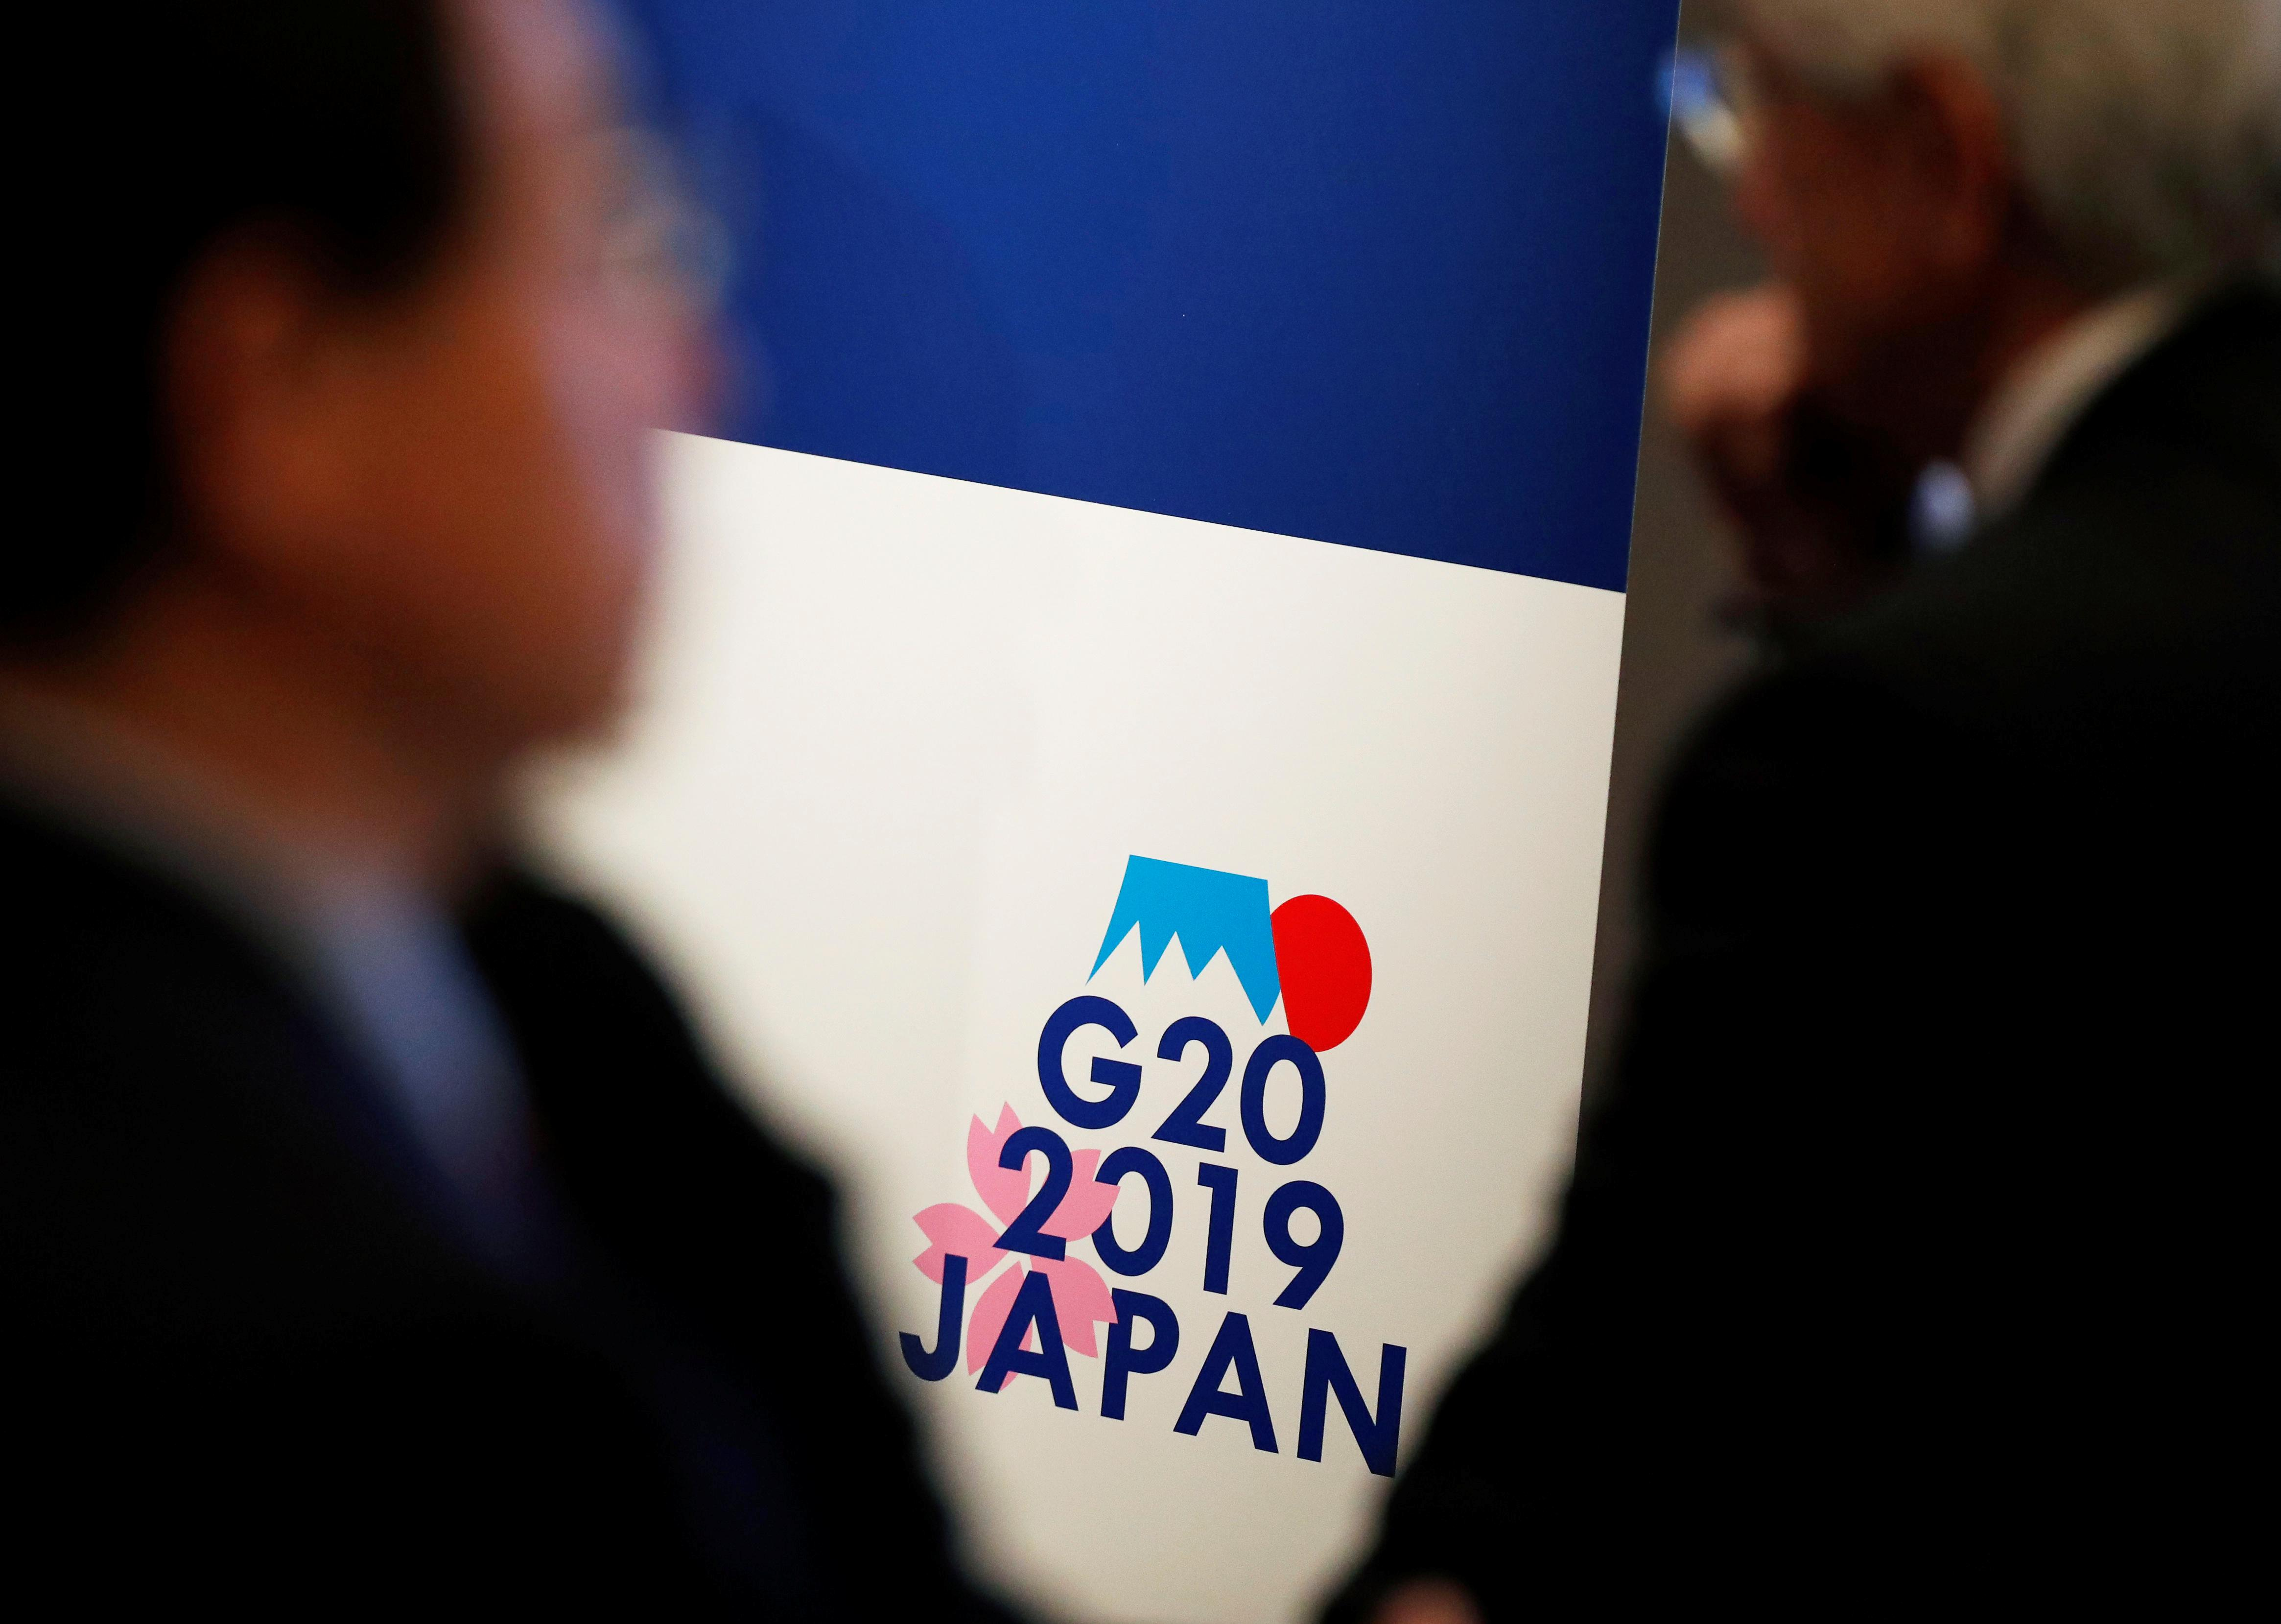 Draft communique of G20 summit backs free trade: Japan media